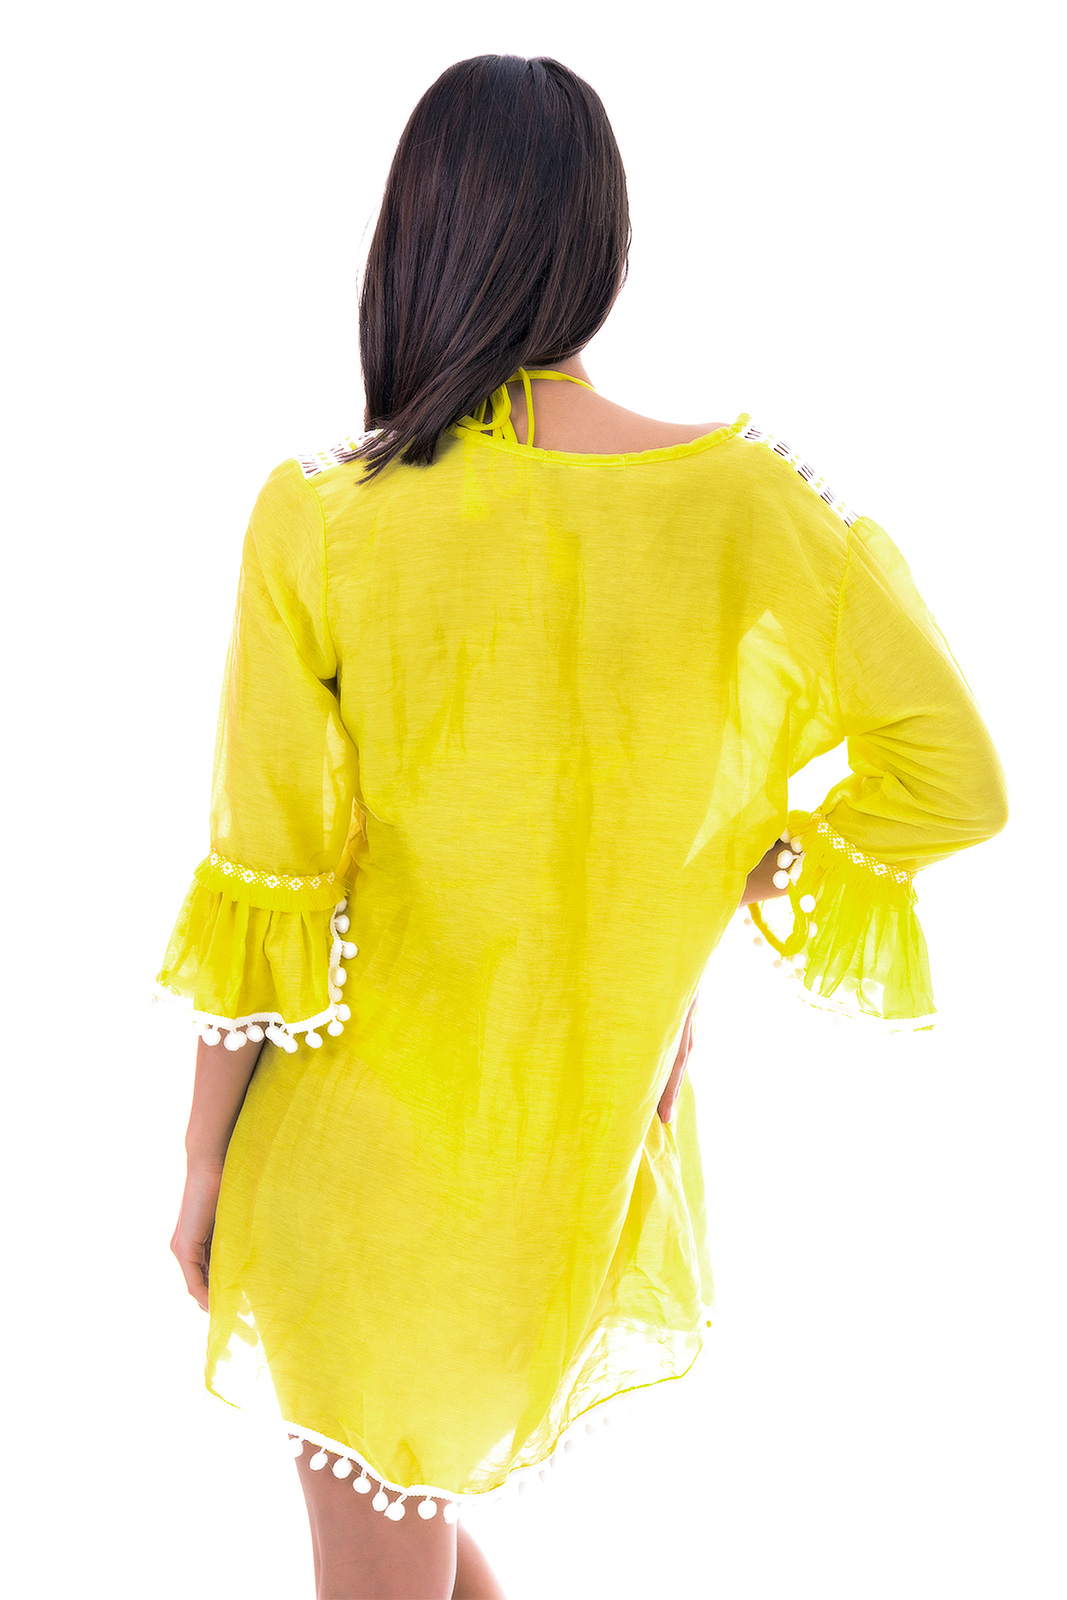 31b3bc3916a Yellow Beach Tunic With White Guipure - Hindi Tunic - Despi